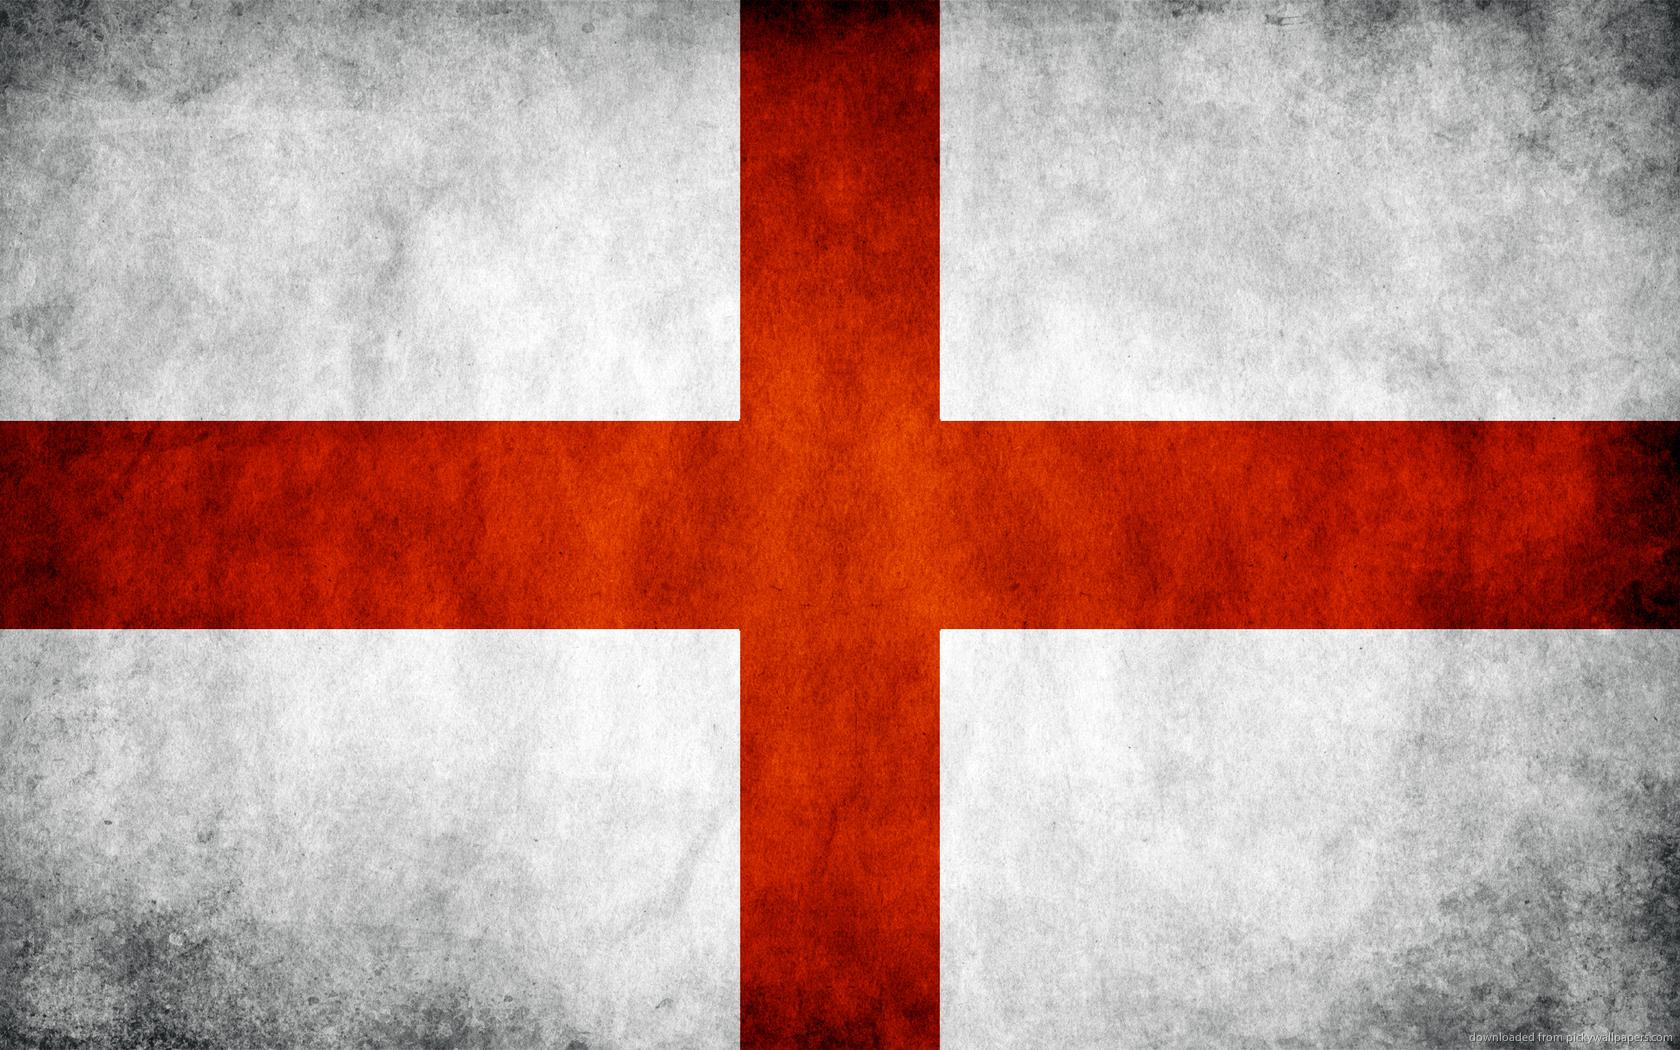 England Flag Wallpaper Search Results newdesktopwallpapersinfo 1680x1050